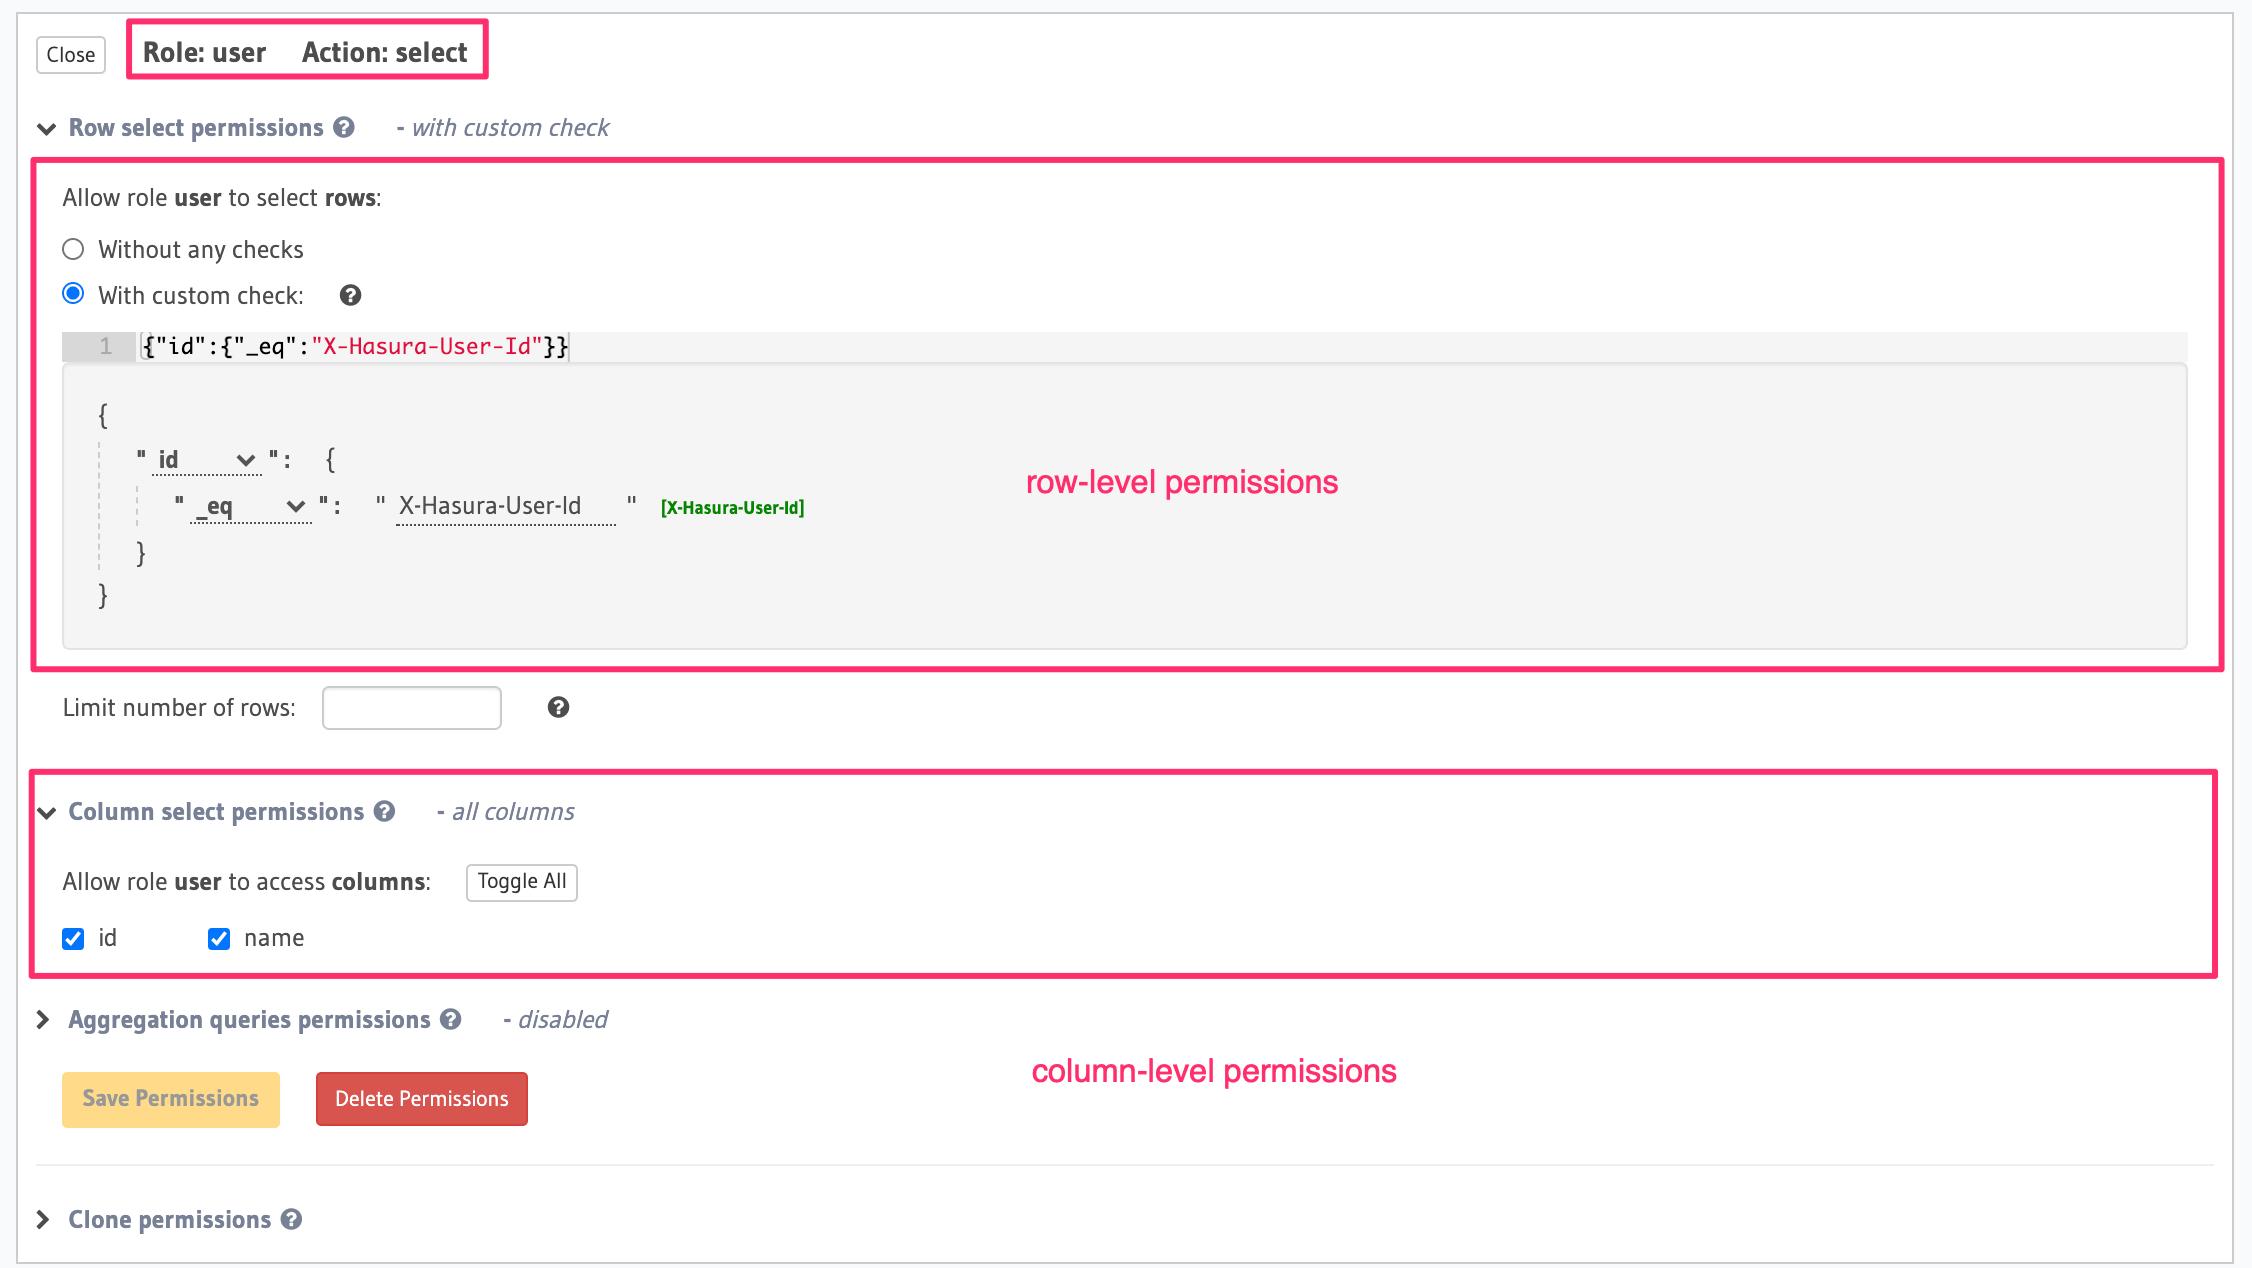 https://hasura.io/docs/1.0/_images/permission-basics-simple-example1.png